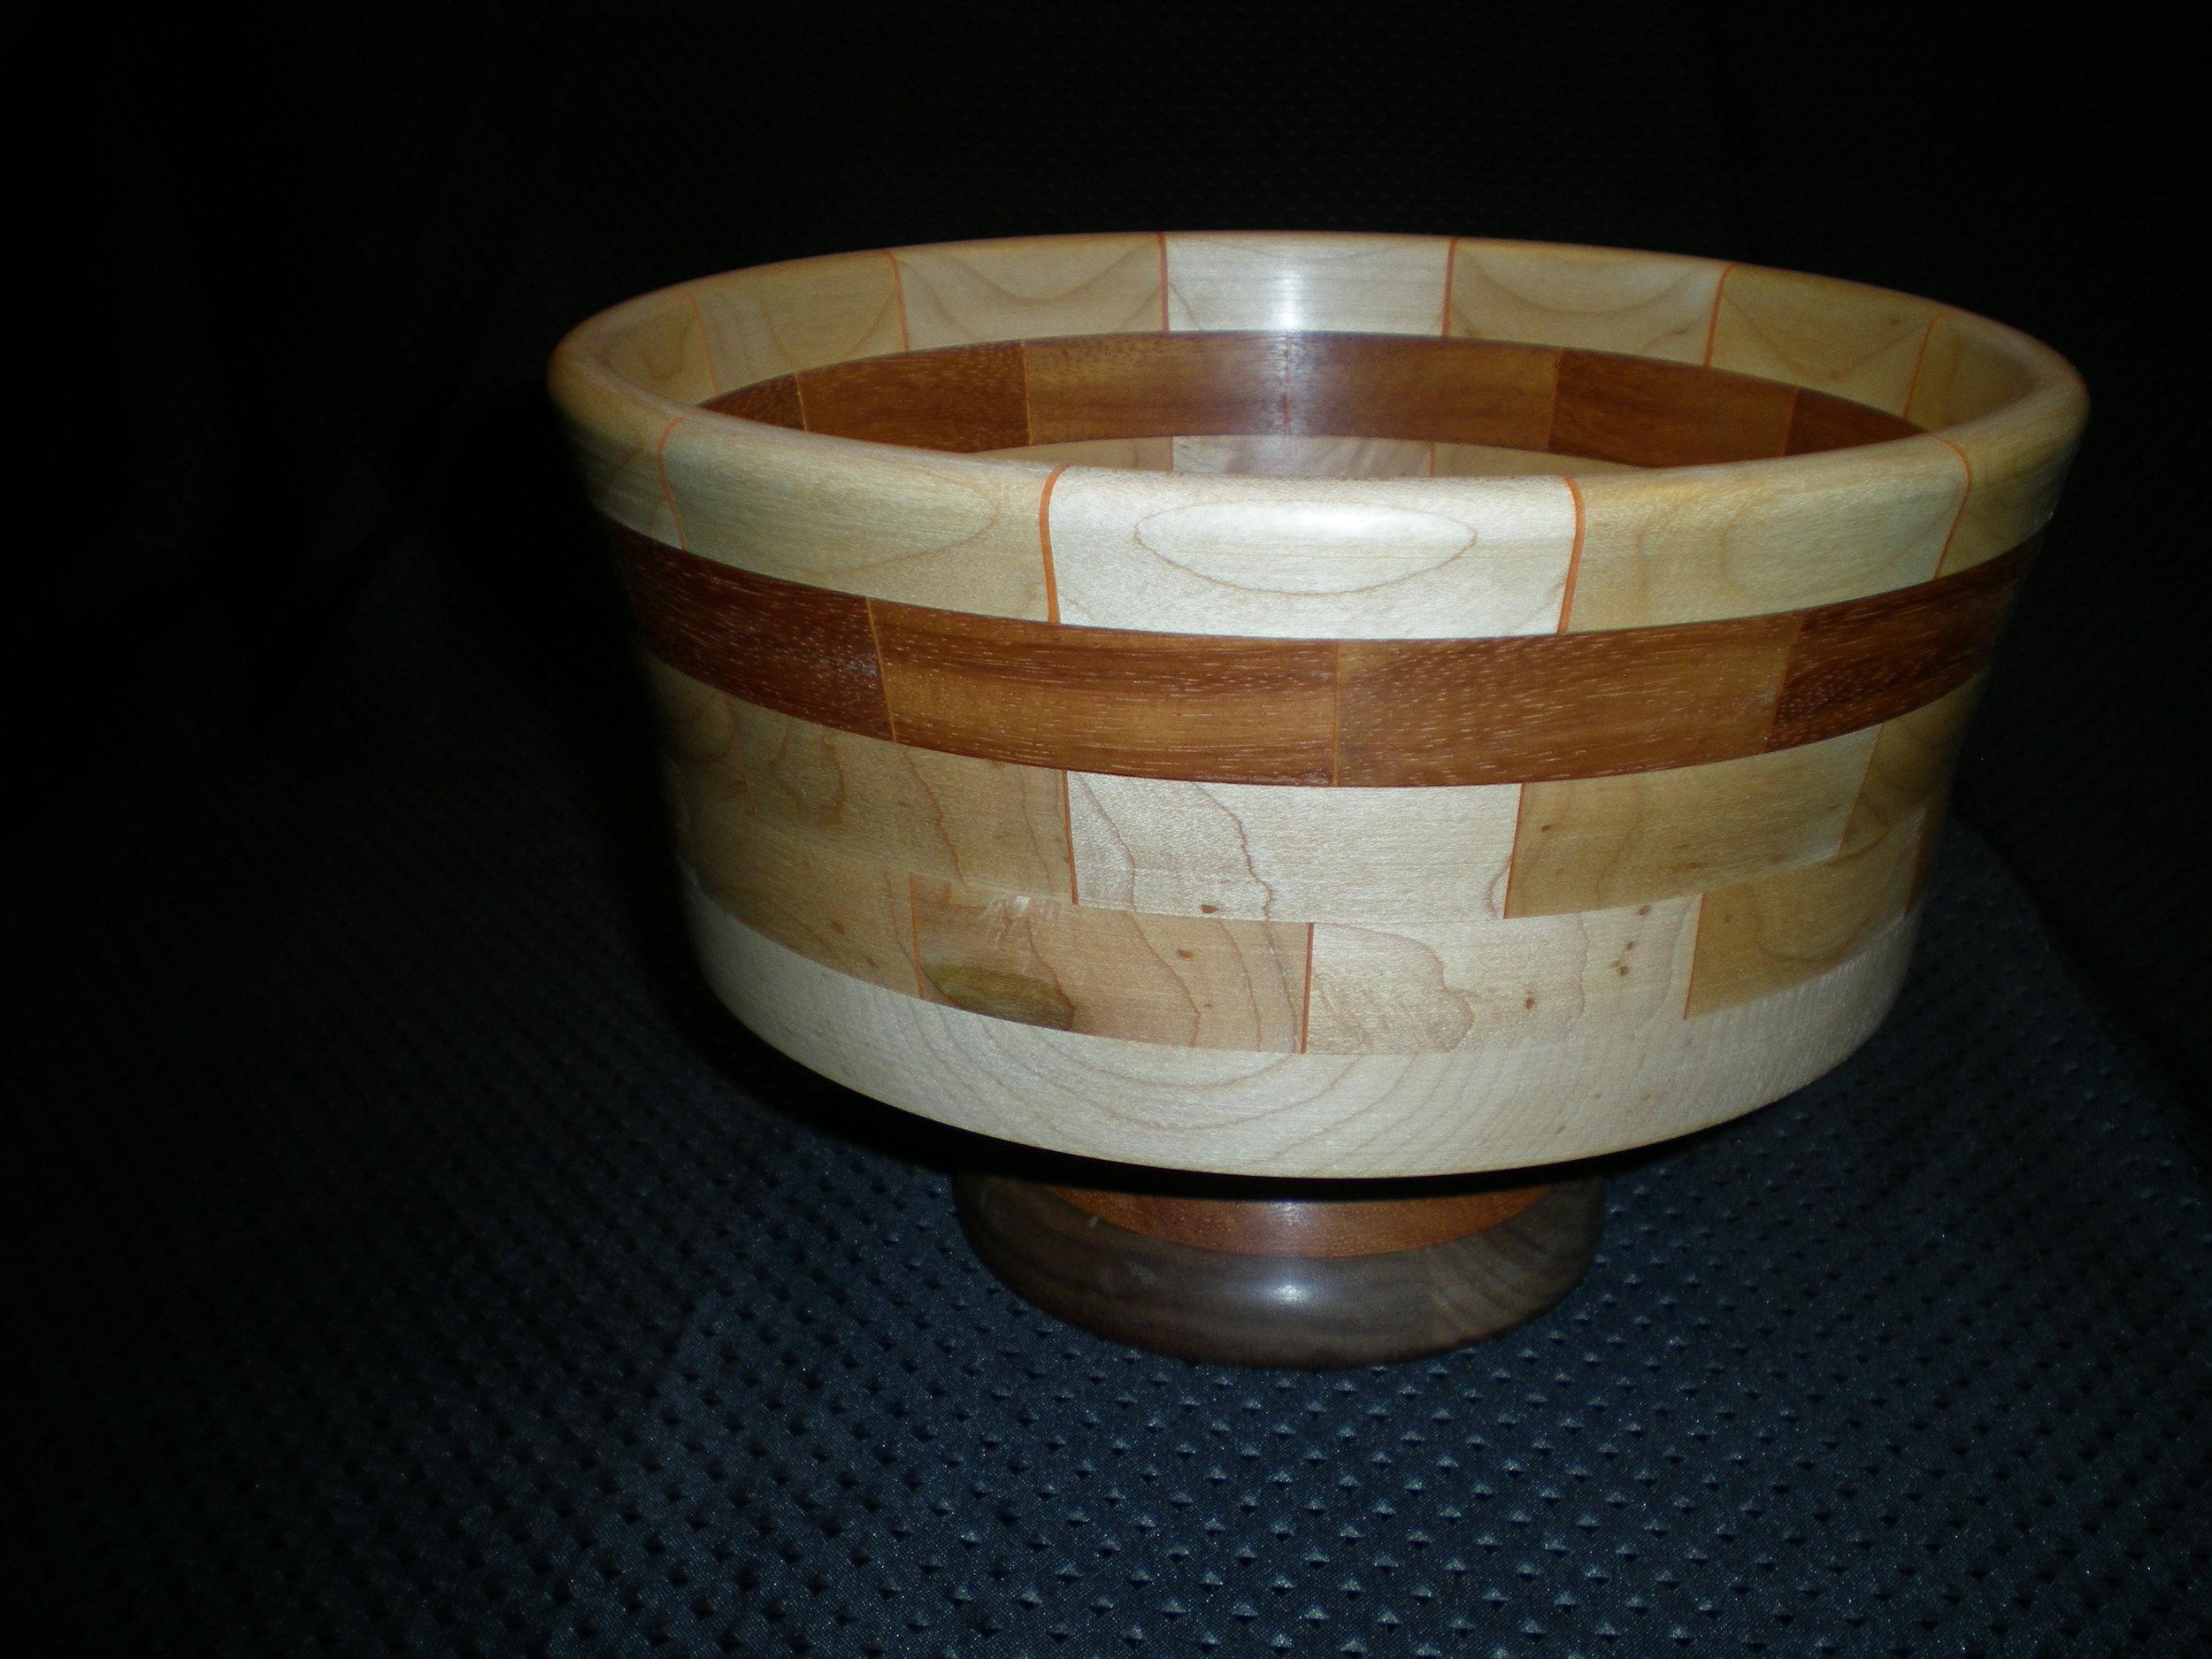 RJC Wood Creations - Bowls (22).JPG